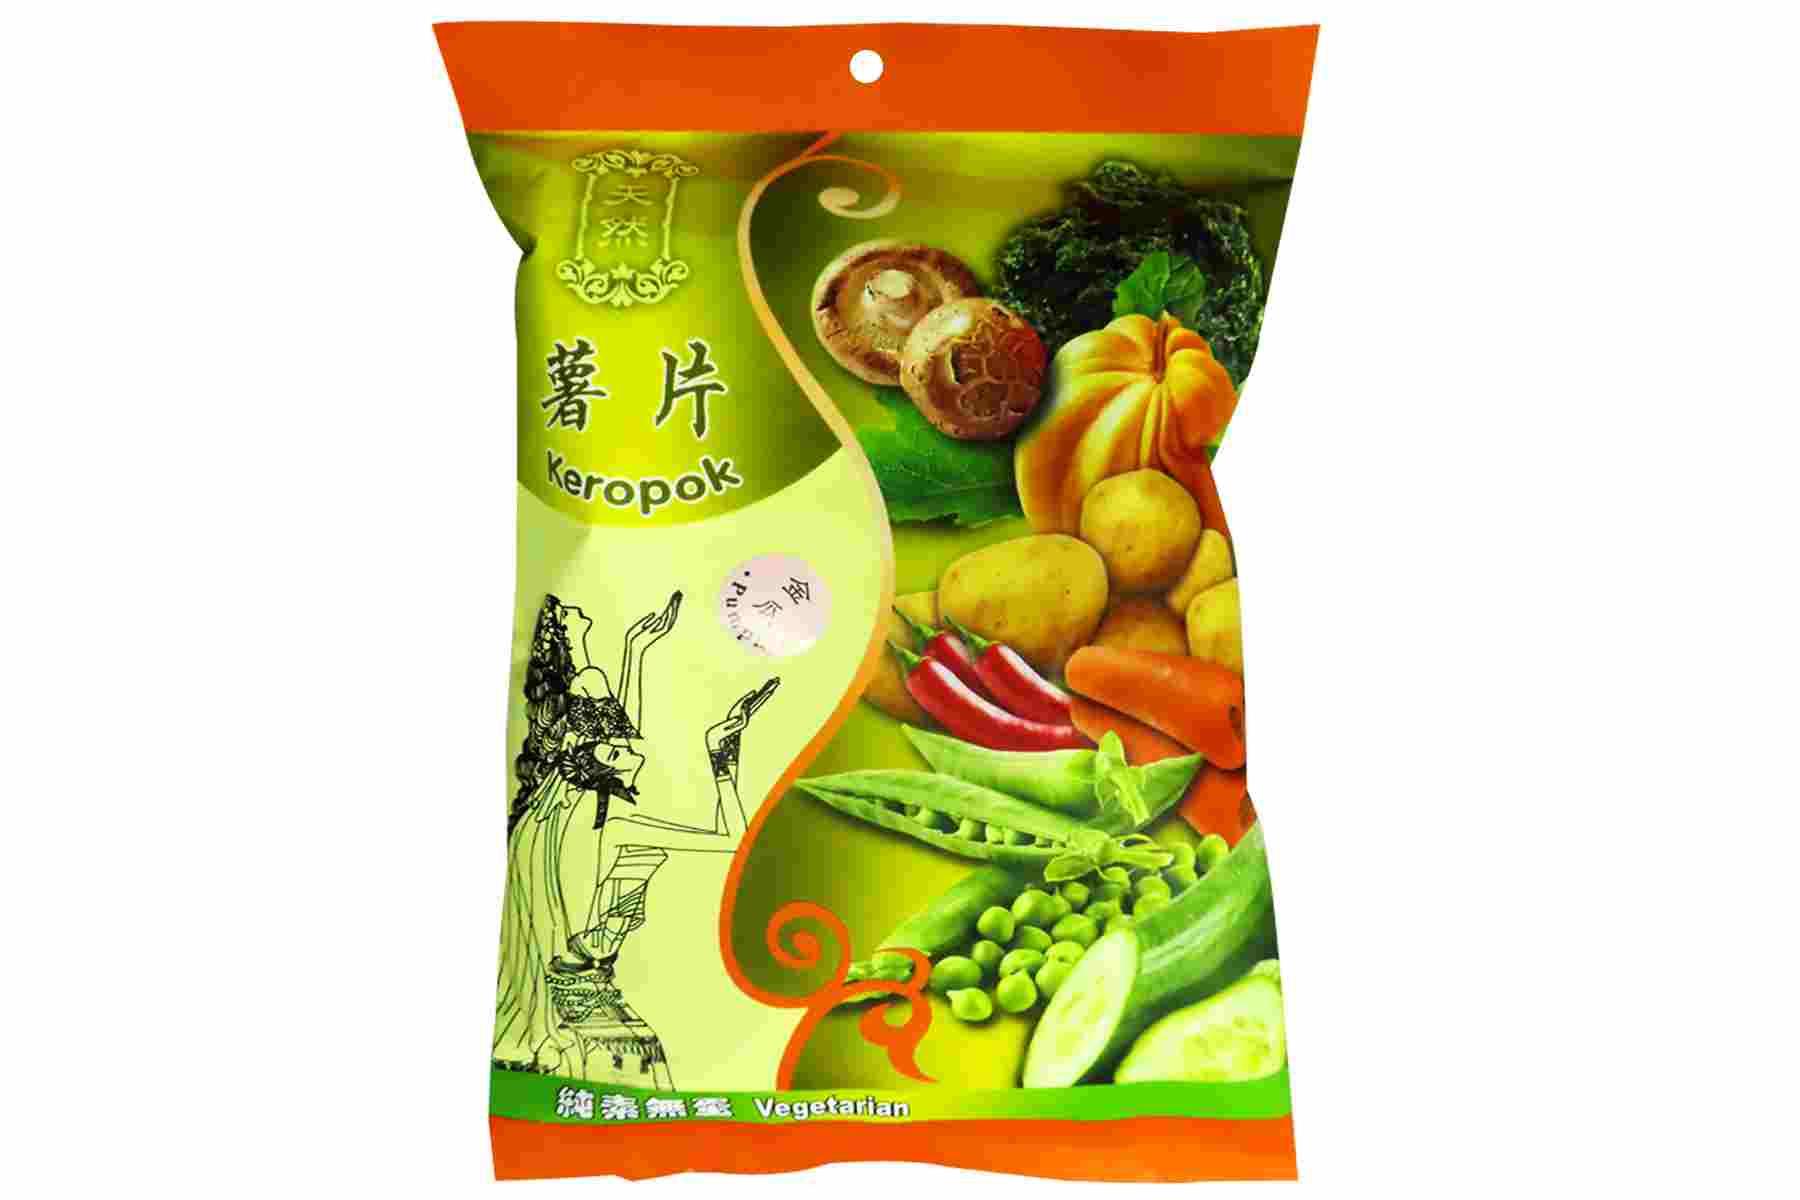 Image Kun Yi Pumpkin Cracker 昆益 - 金瓜薯片 40grams